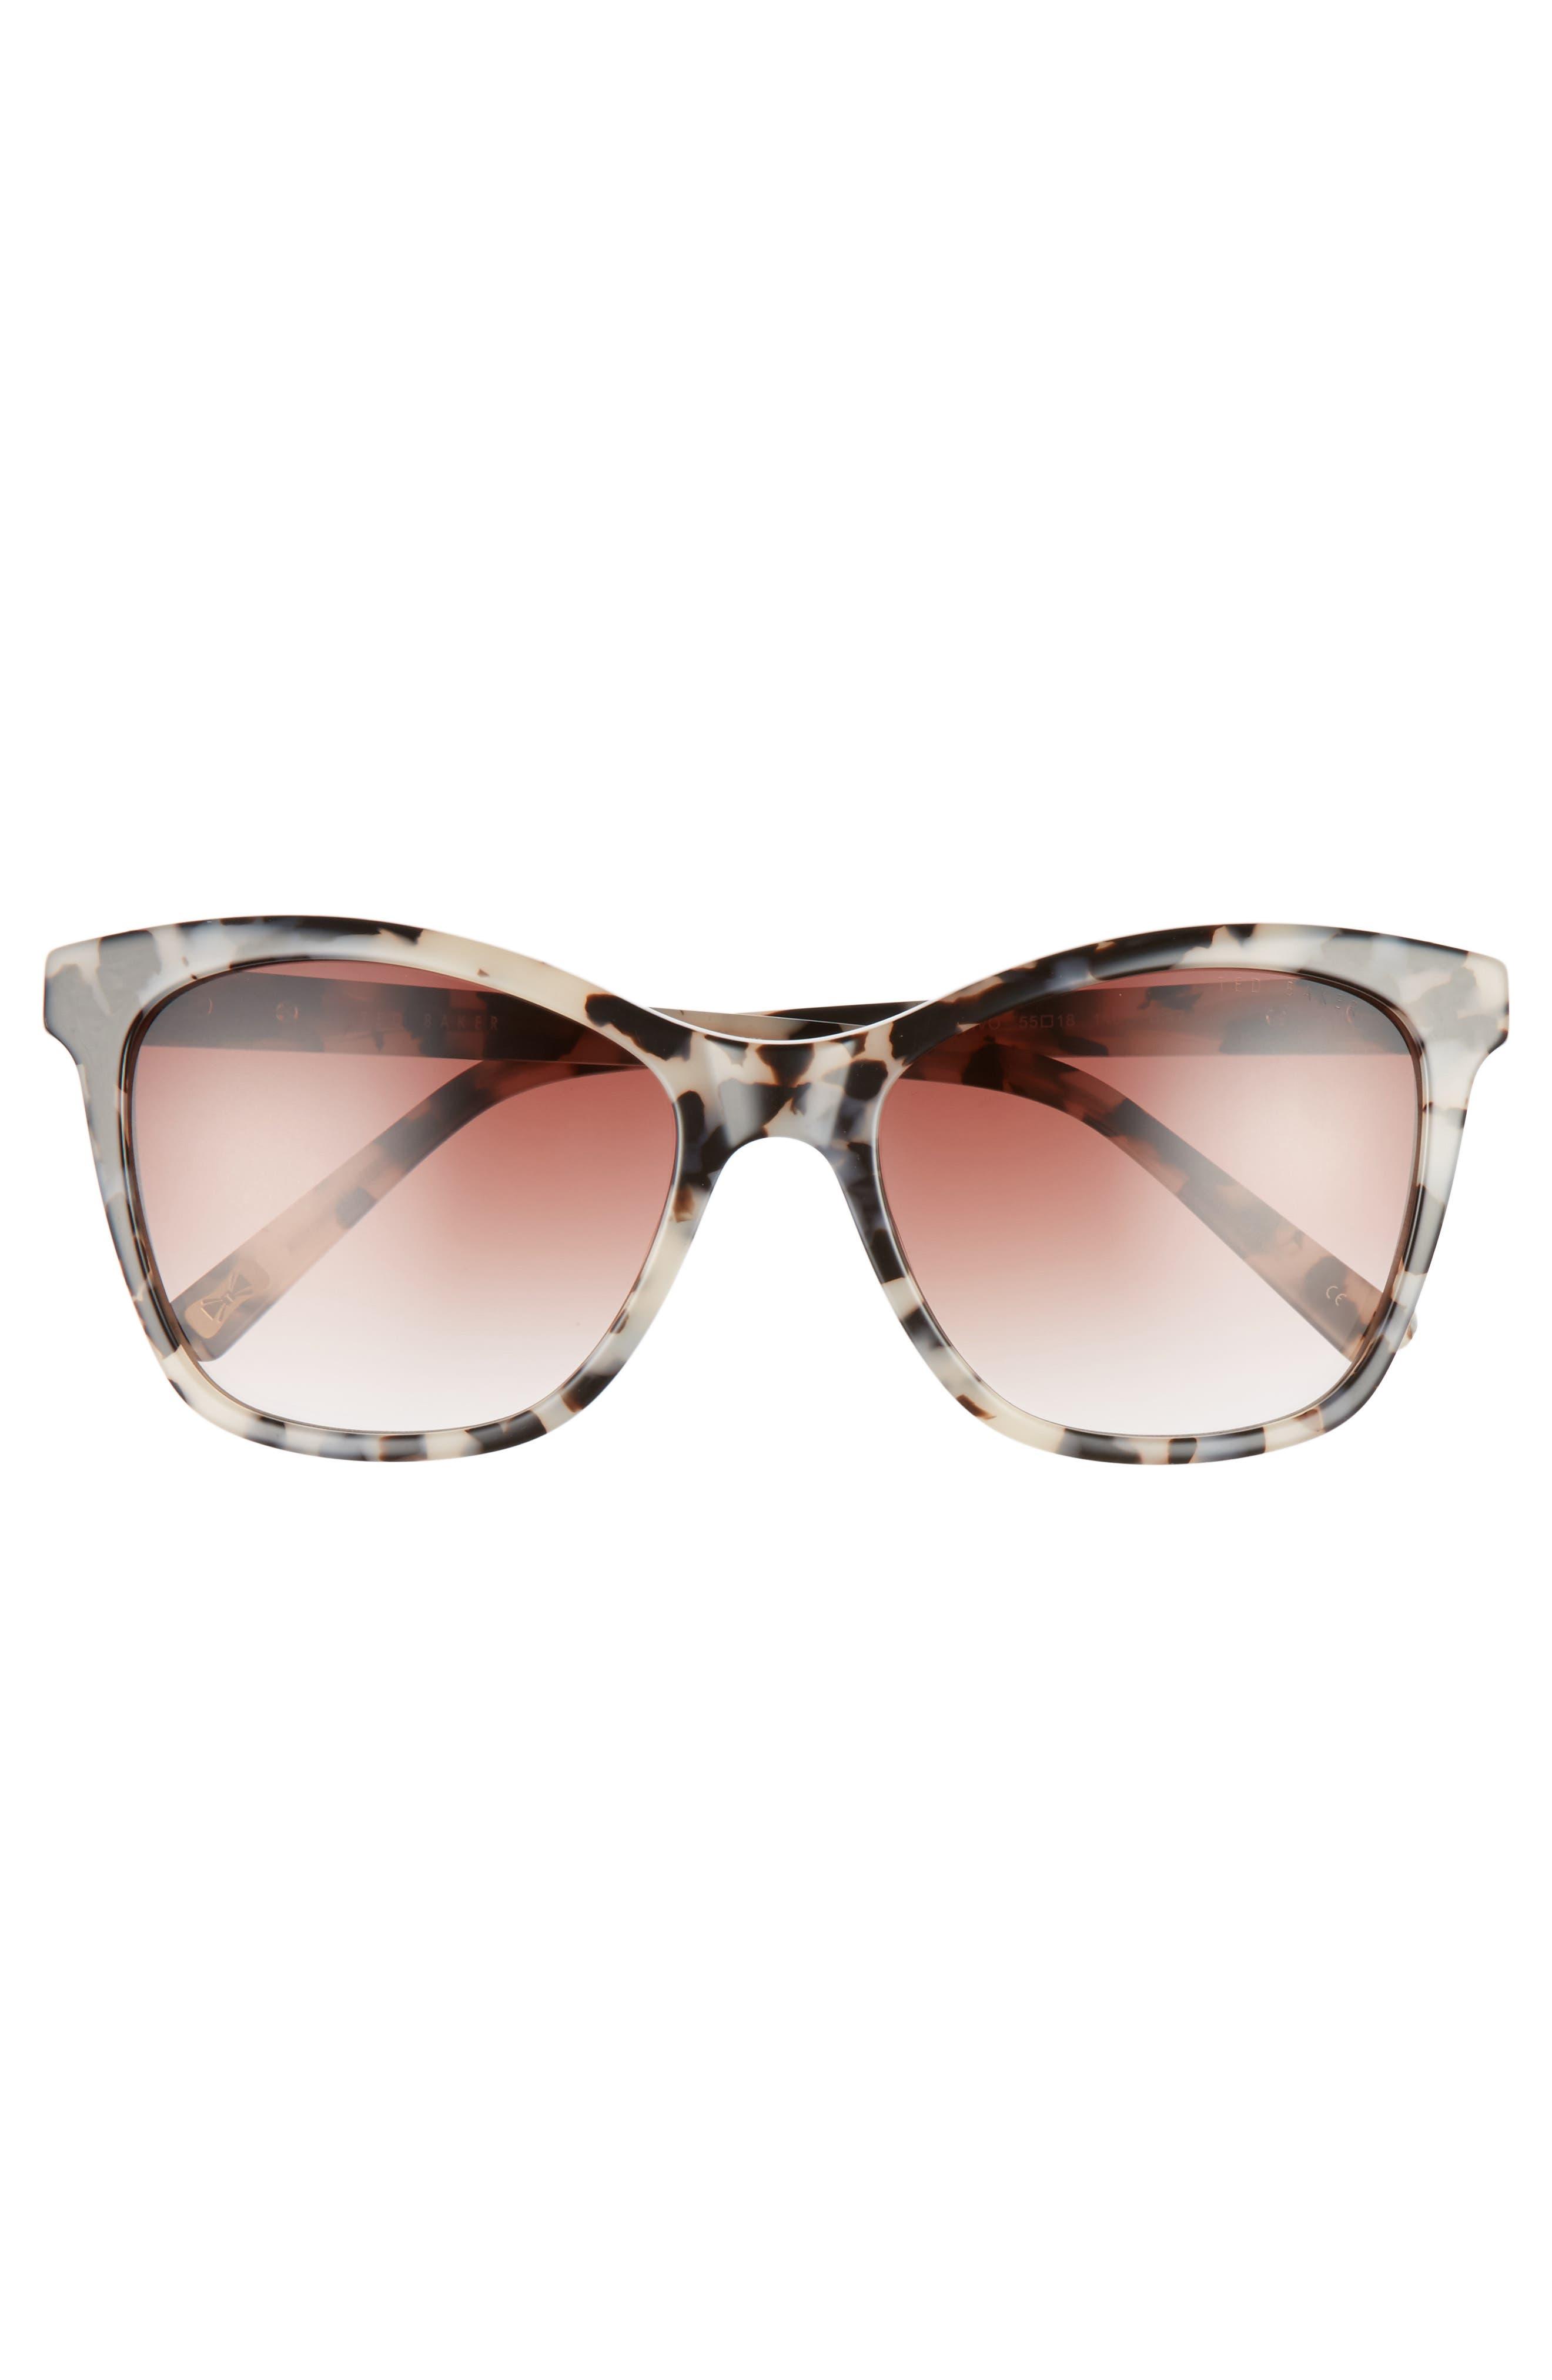 55mm Cat Eye Sunglasses,                             Alternate thumbnail 6, color,